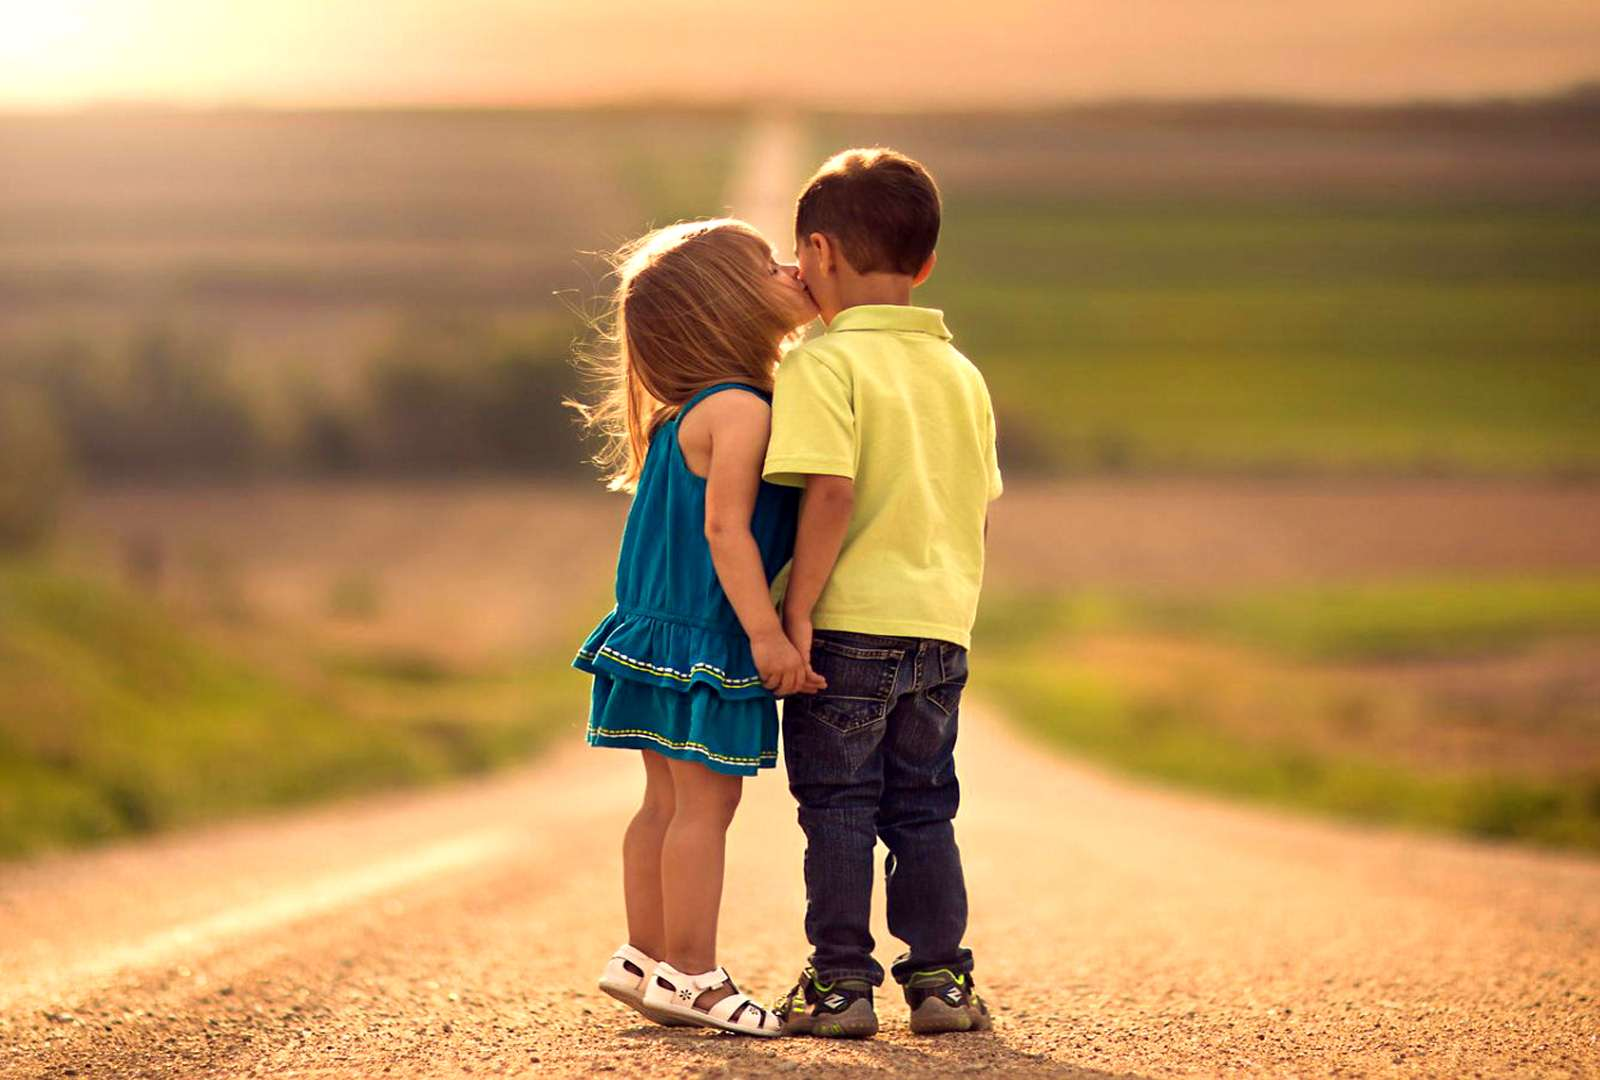 Romantic Hug Day Image with GF, BF & Crush